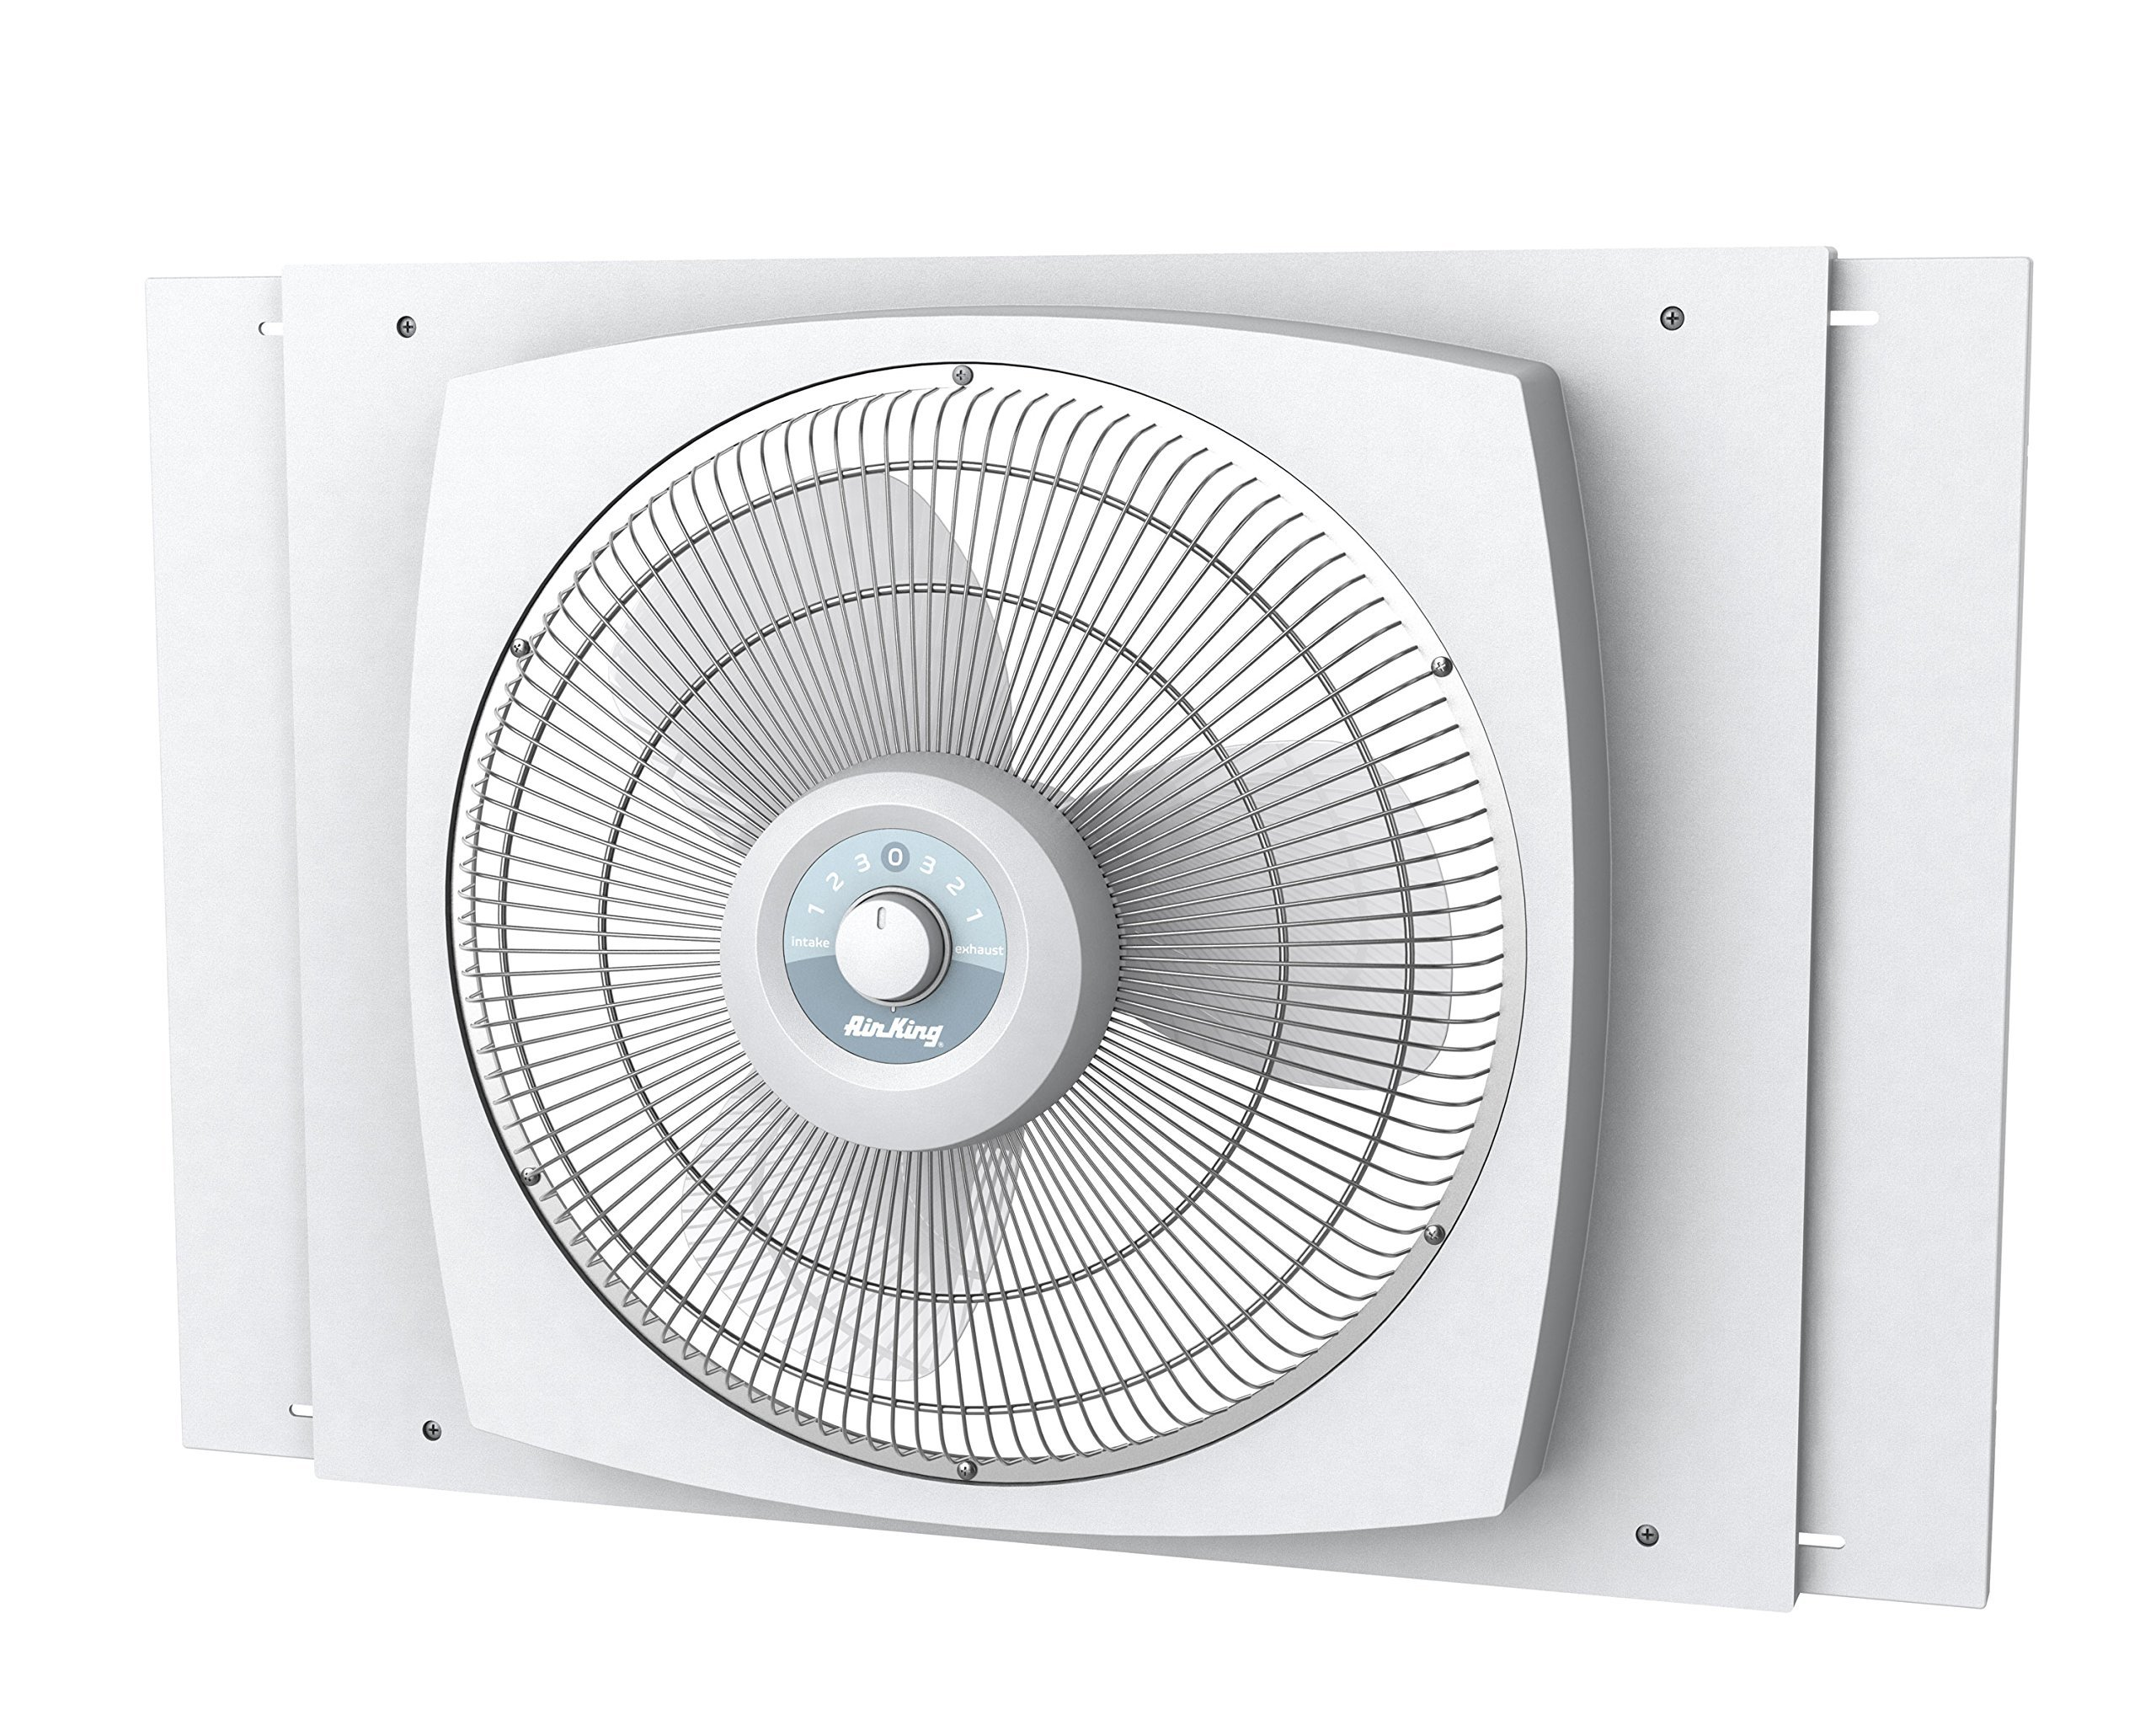 Air King 9155 Window Fan, 16-Inch (Renewed) by Air King